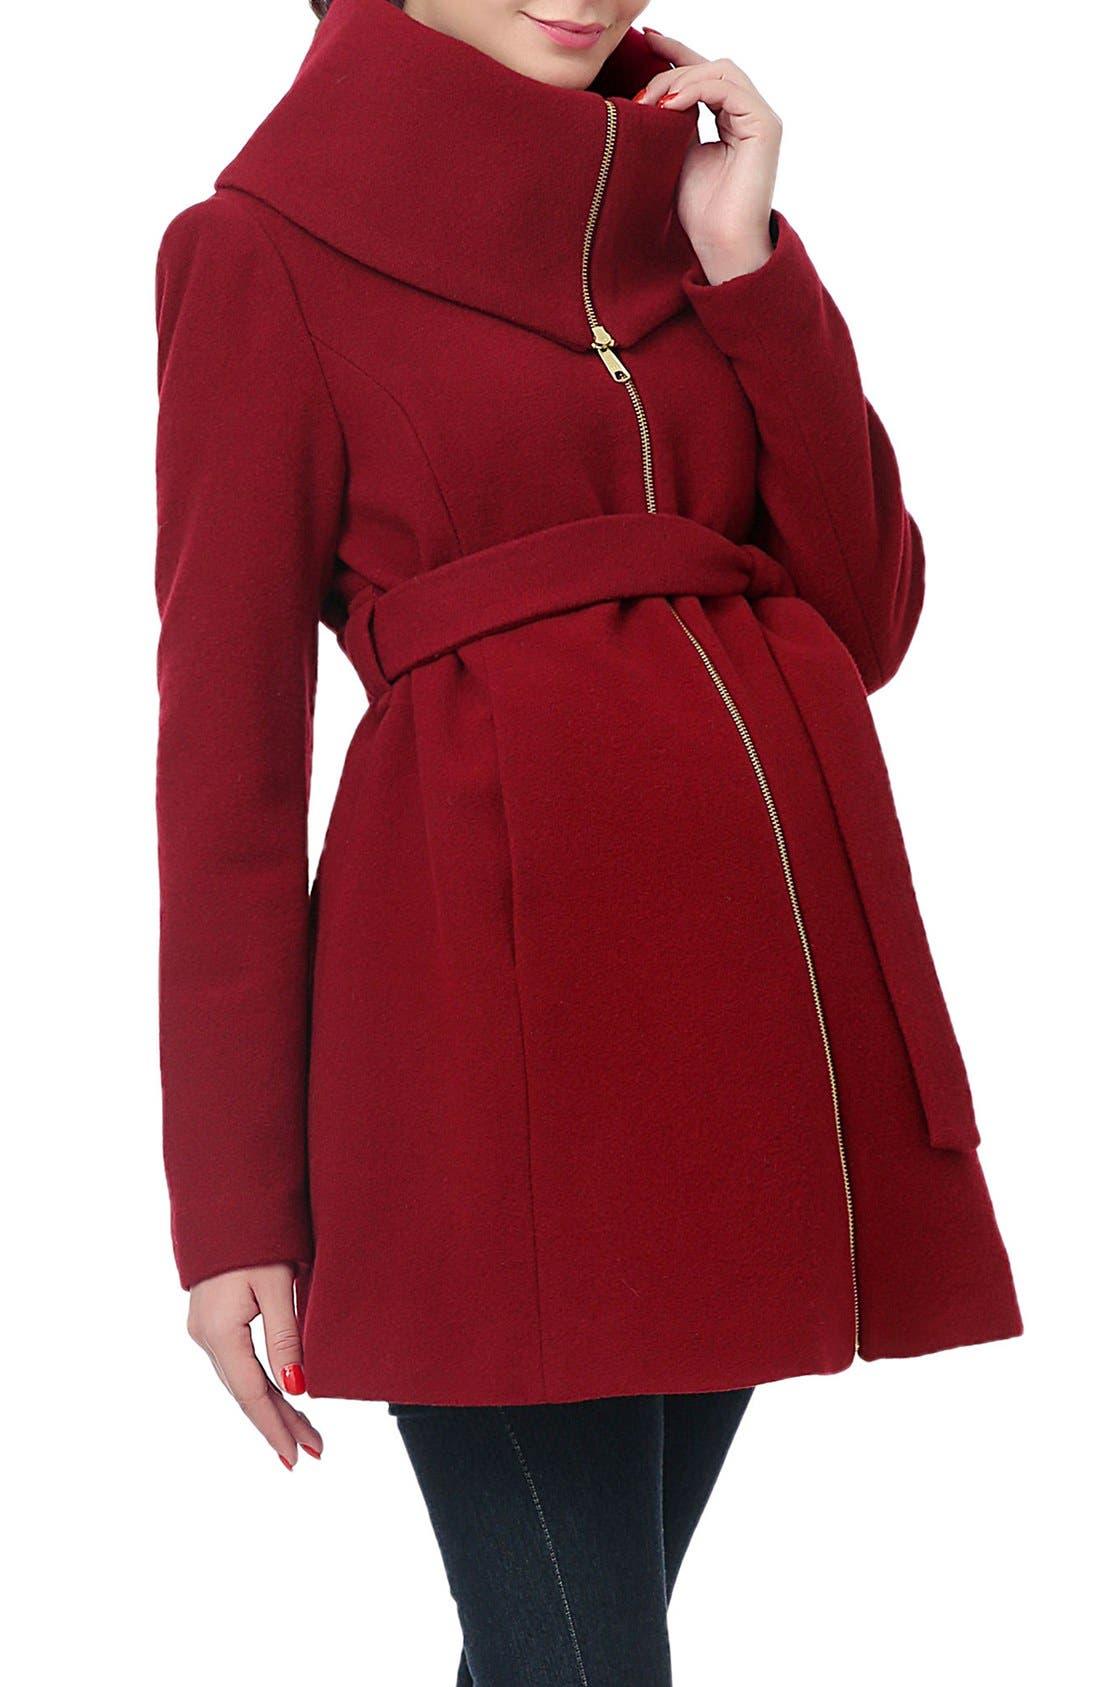 Main Image - Kimi and Kai 'Mia' High Collar Maternity Coat